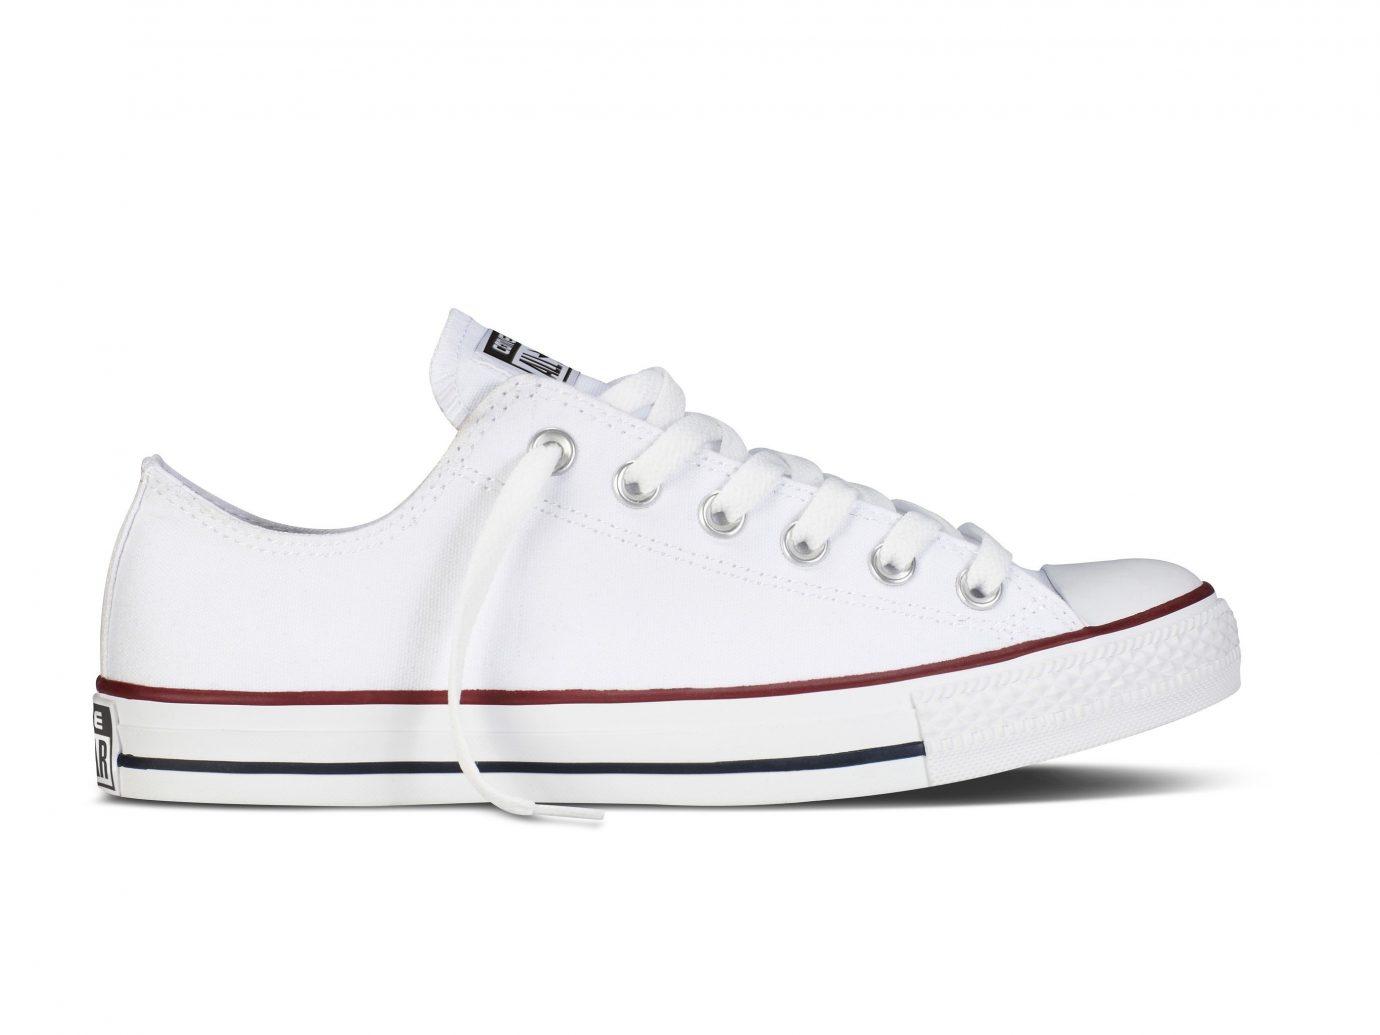 Style + Design footwear shoe white clothing walking shoe sneakers athletic shoe product tennis shoe running shoe cross training shoe leather outdoor shoe